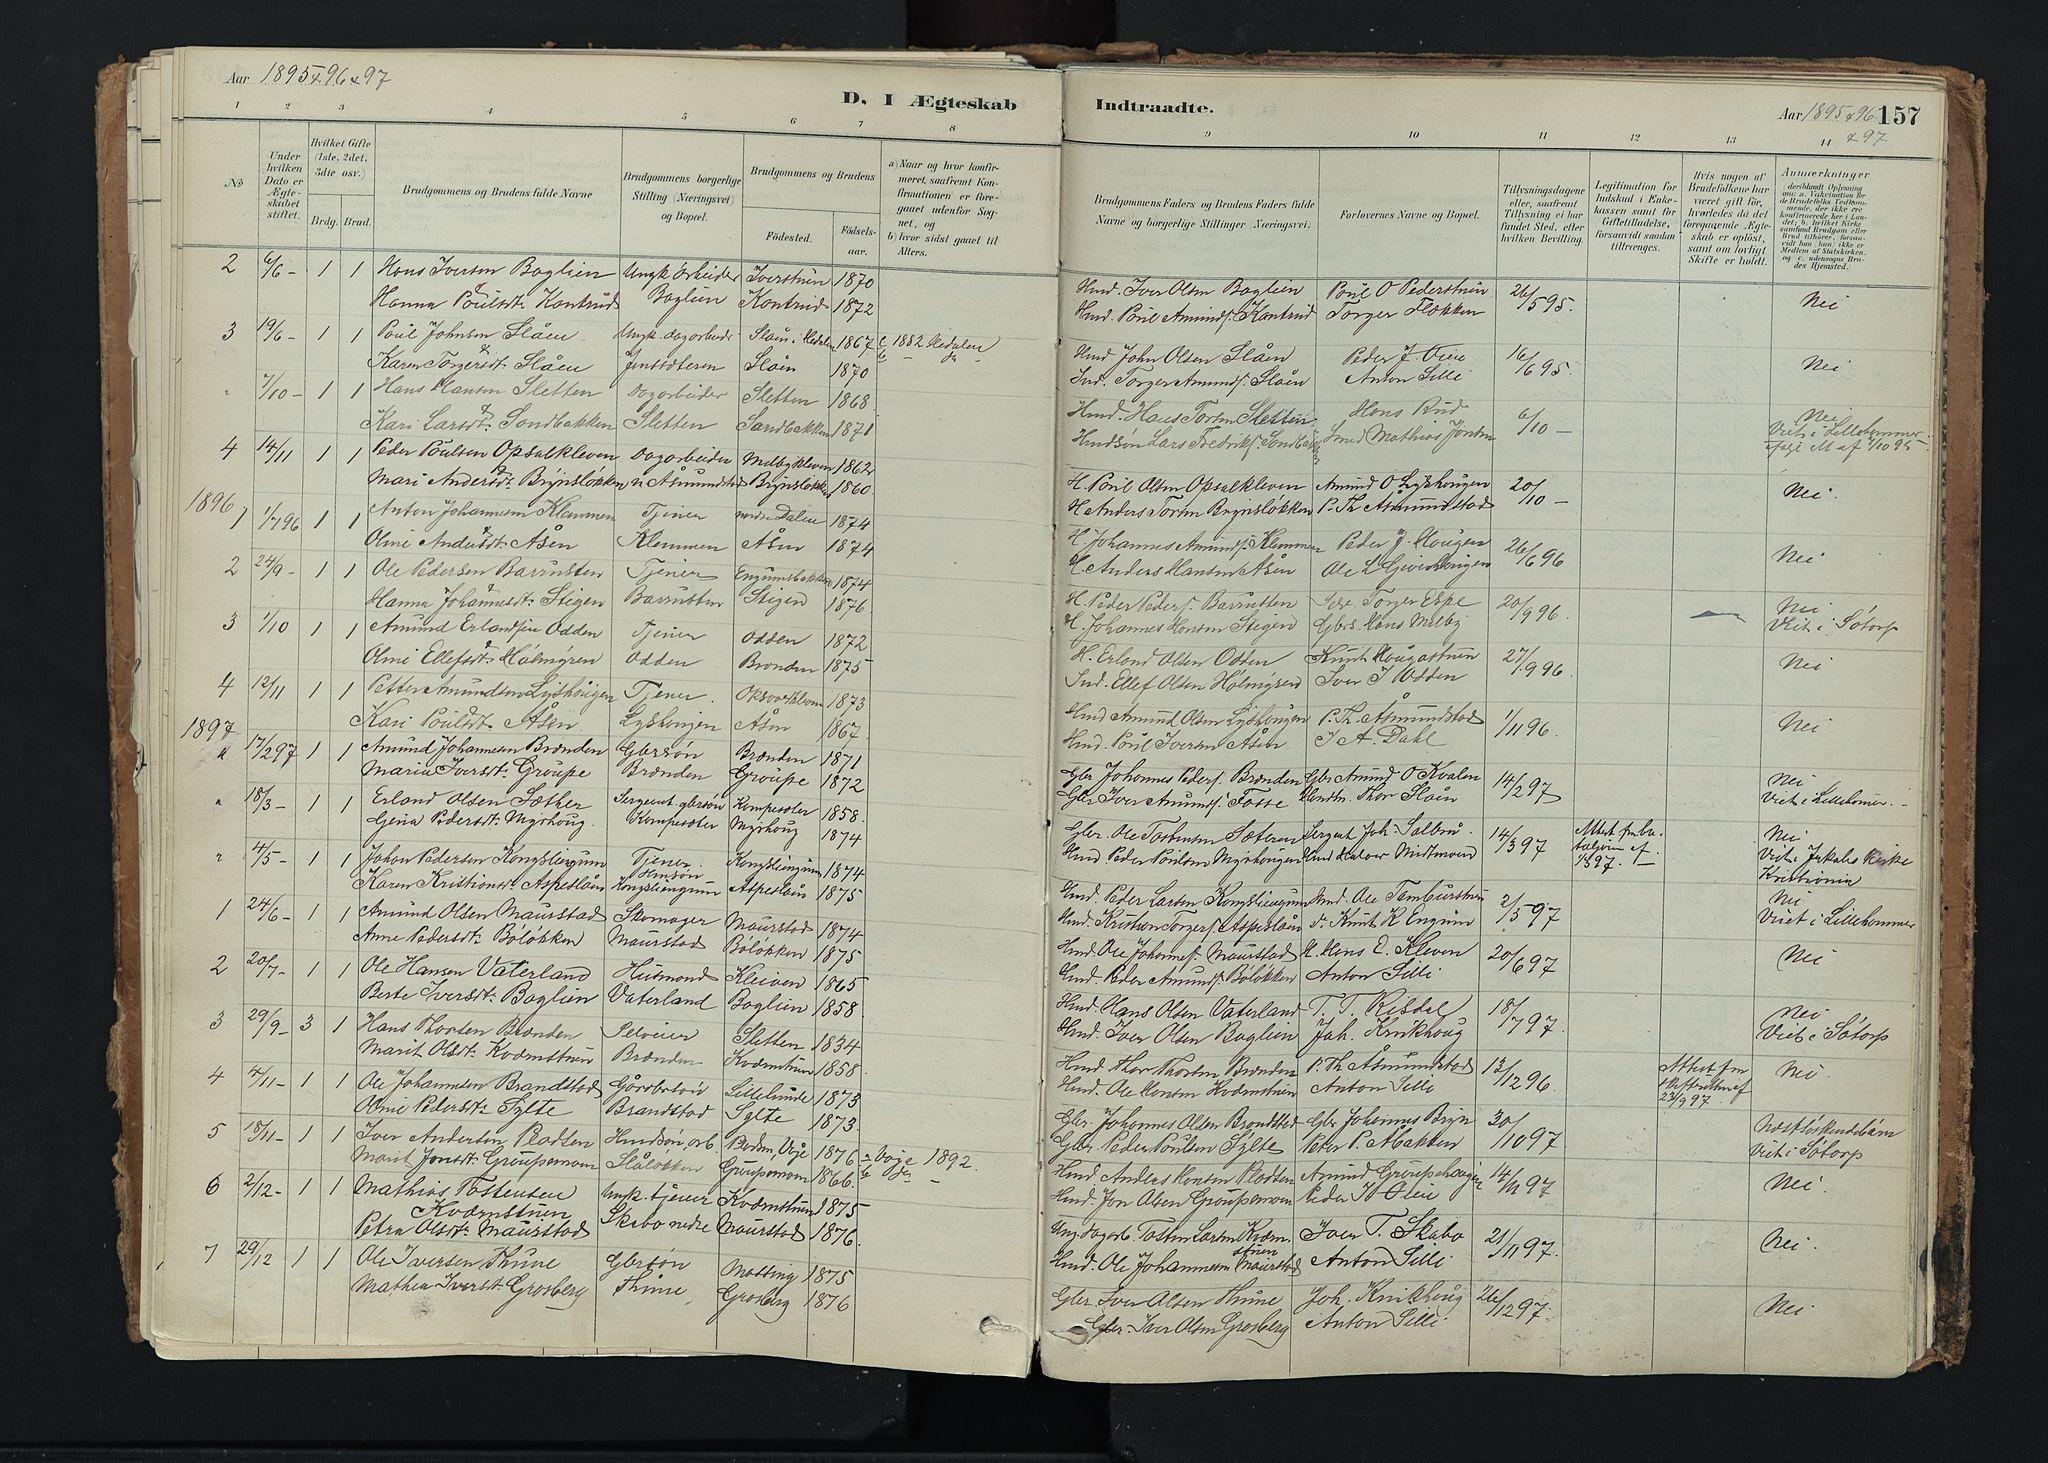 SAH, Nord-Fron prestekontor, Ministerialbok nr. 5, 1884-1914, s. 157